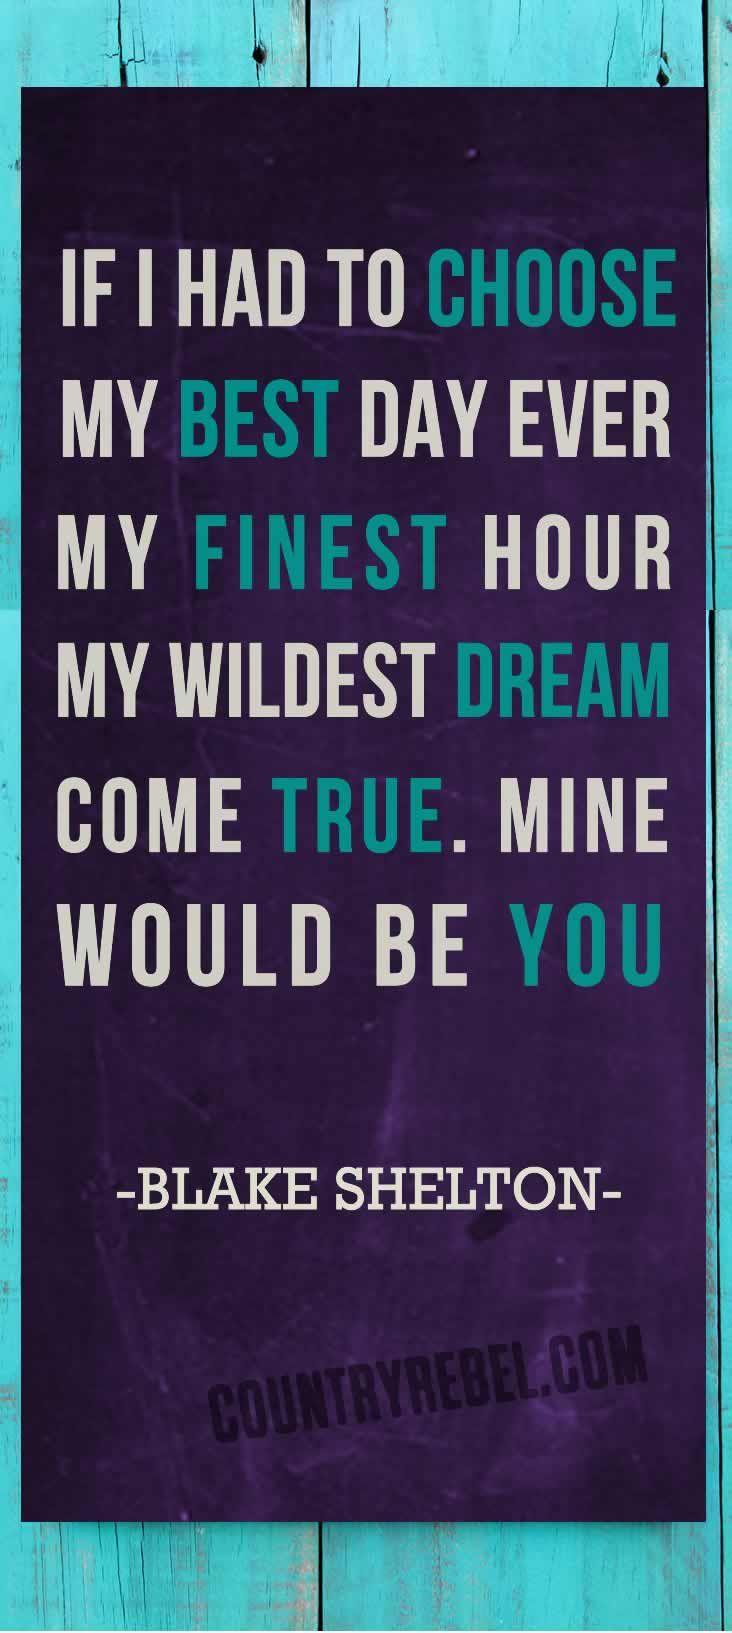 Blake Shelton Lyrics - Songs - Mine Would Be You | Country Rebel Music Videos http://countryrebel.com/blogs/videos/16883015-blake-shelton-mine-would-be-you-video